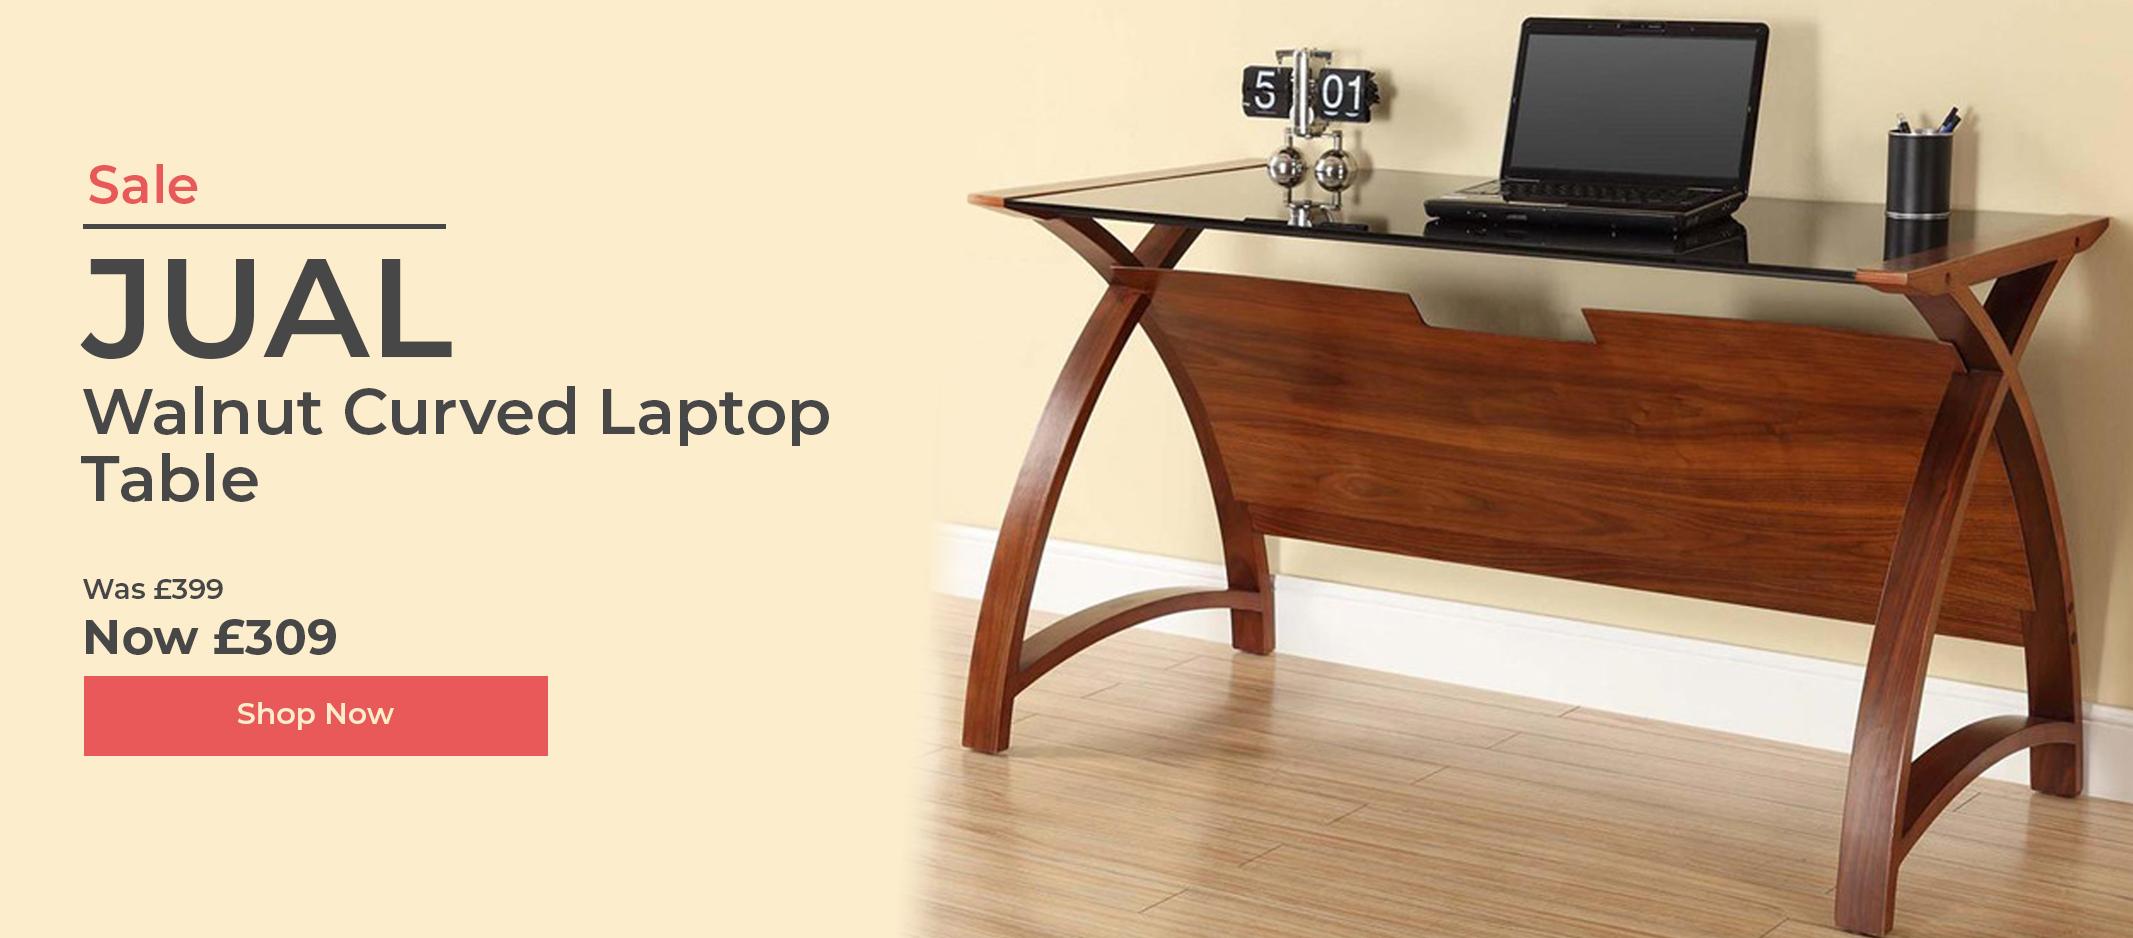 Jual Laptop Table